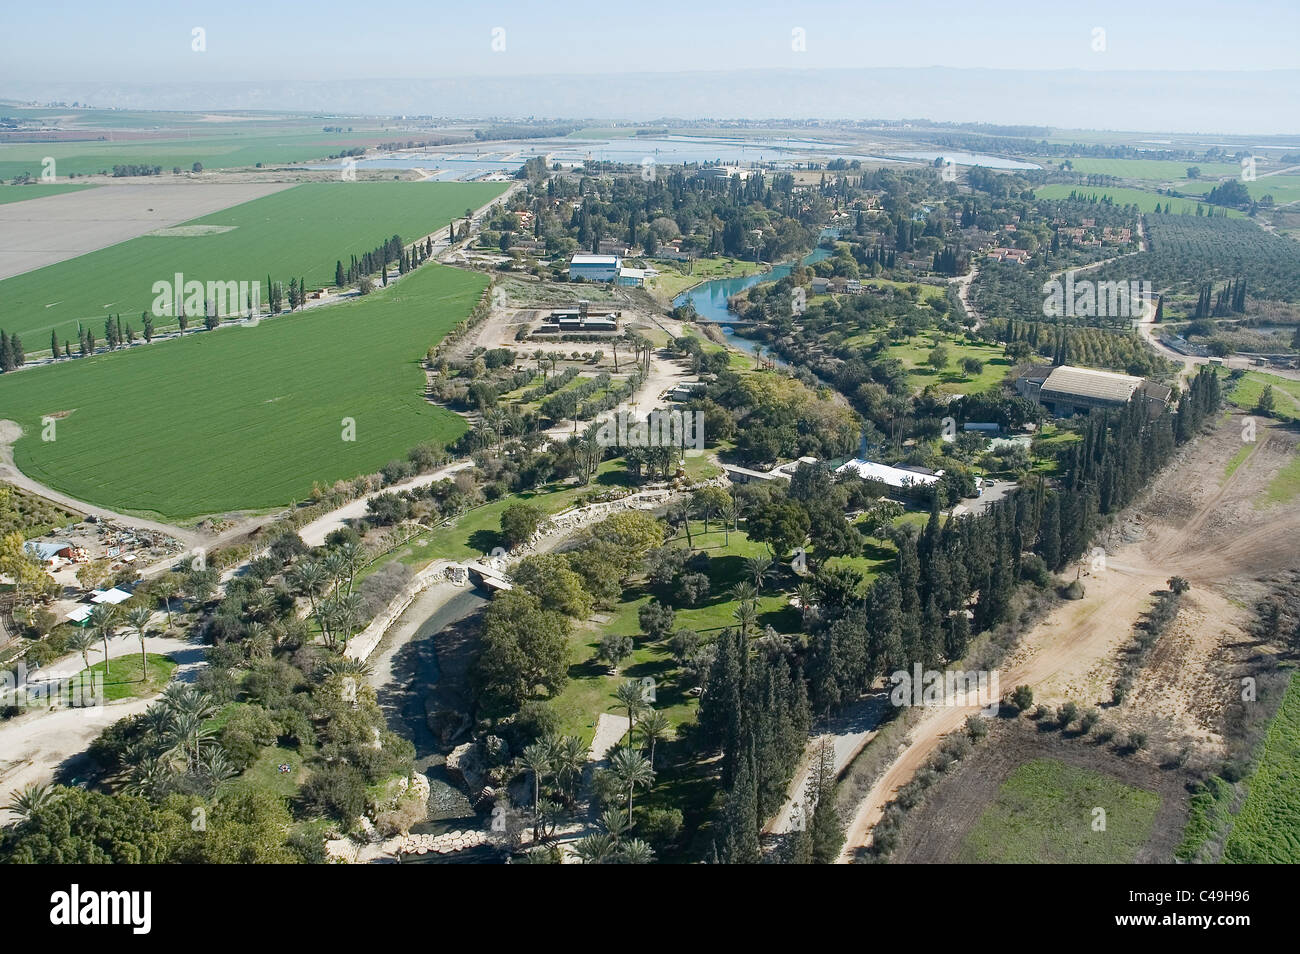 Aerial photograph of kibutz Nir David in the eastern Jezreel valley - Stock Image